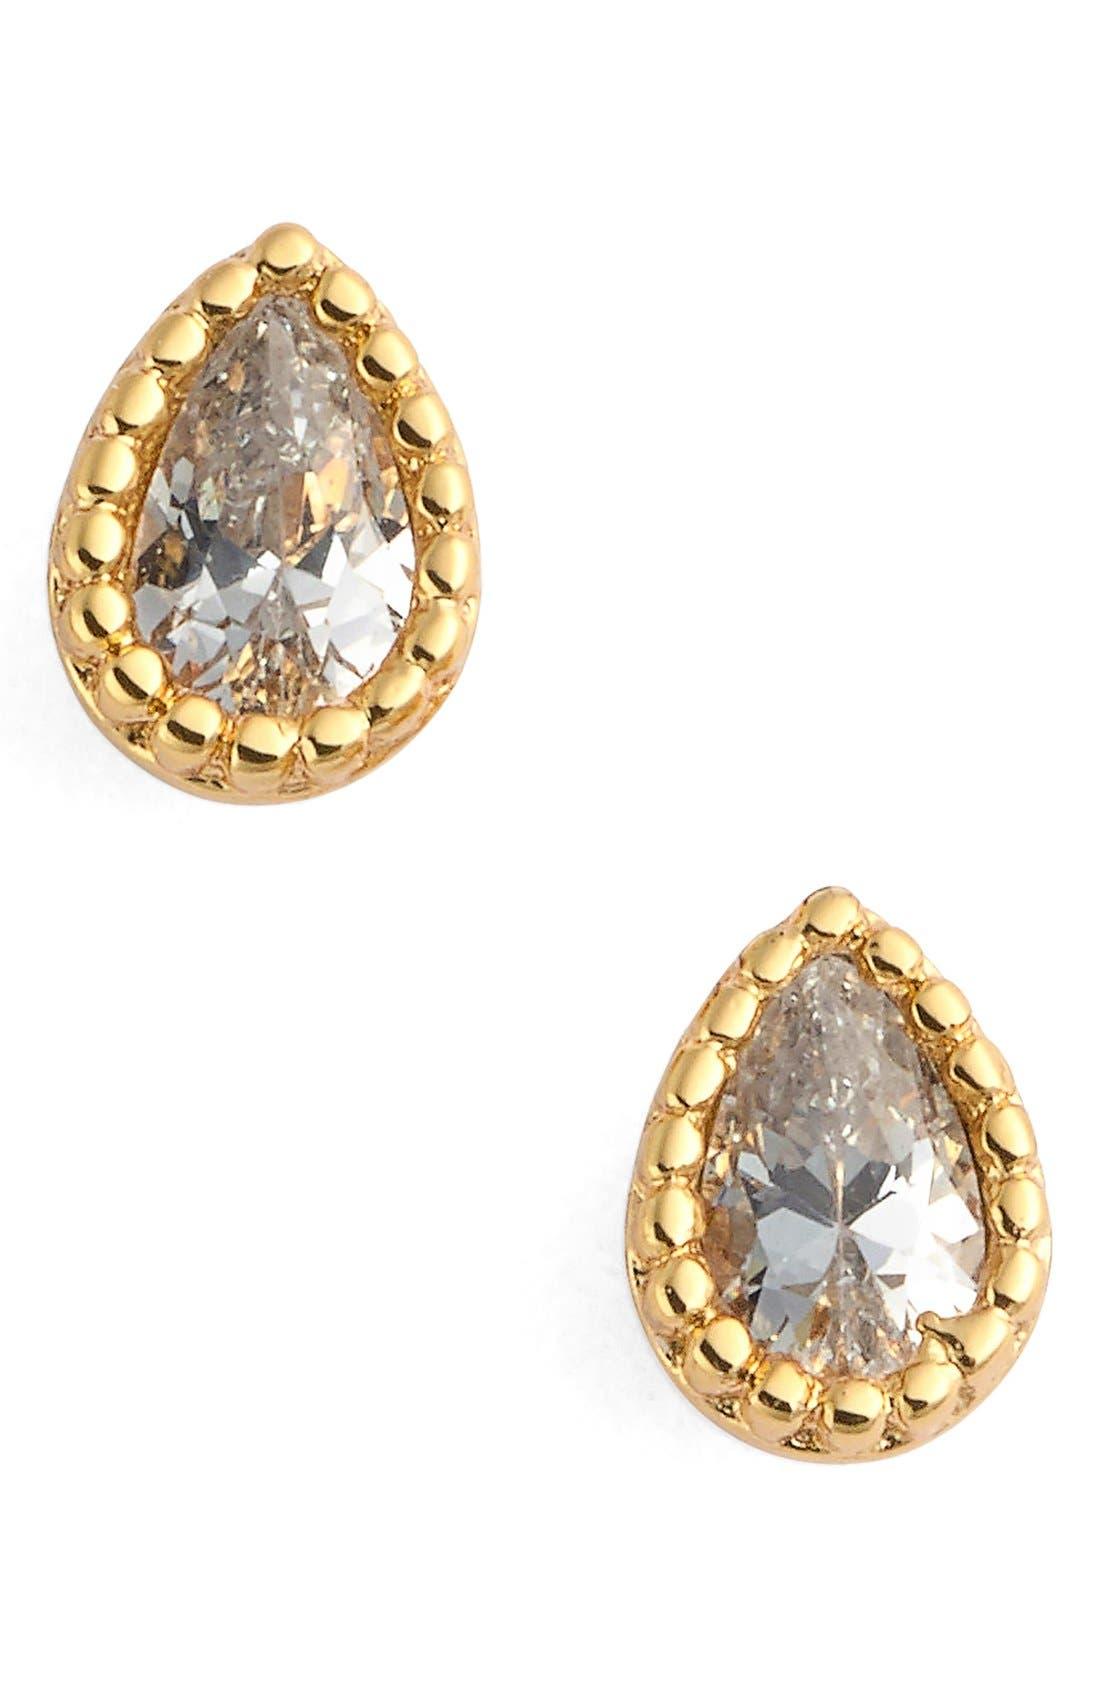 Micro Teardrop Stud Earrings,                             Main thumbnail 1, color,                             Yellow Gold/ Clear